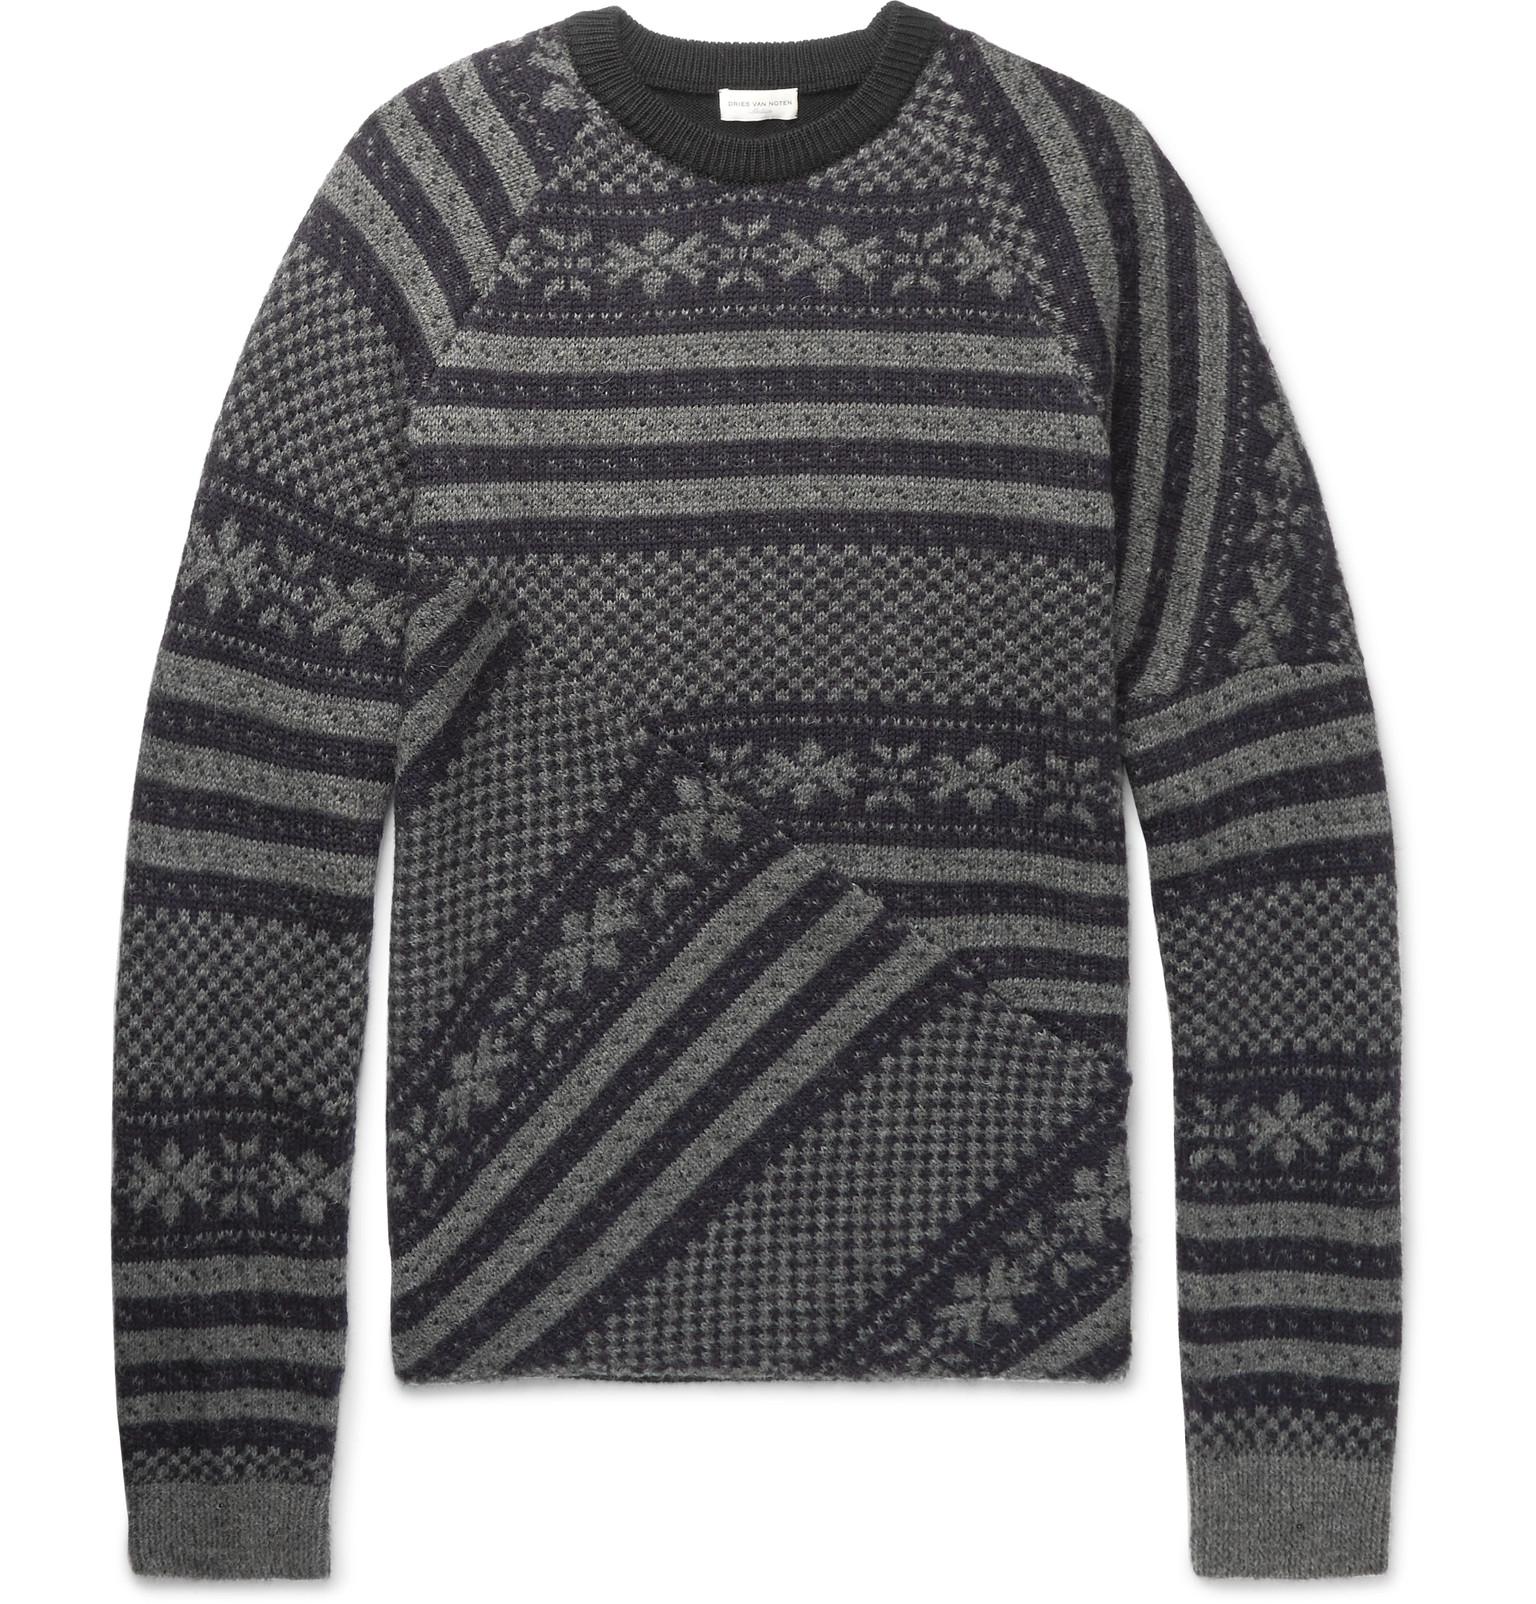 Dries Van Noten - Fair Isle Wool-Blend Sweater